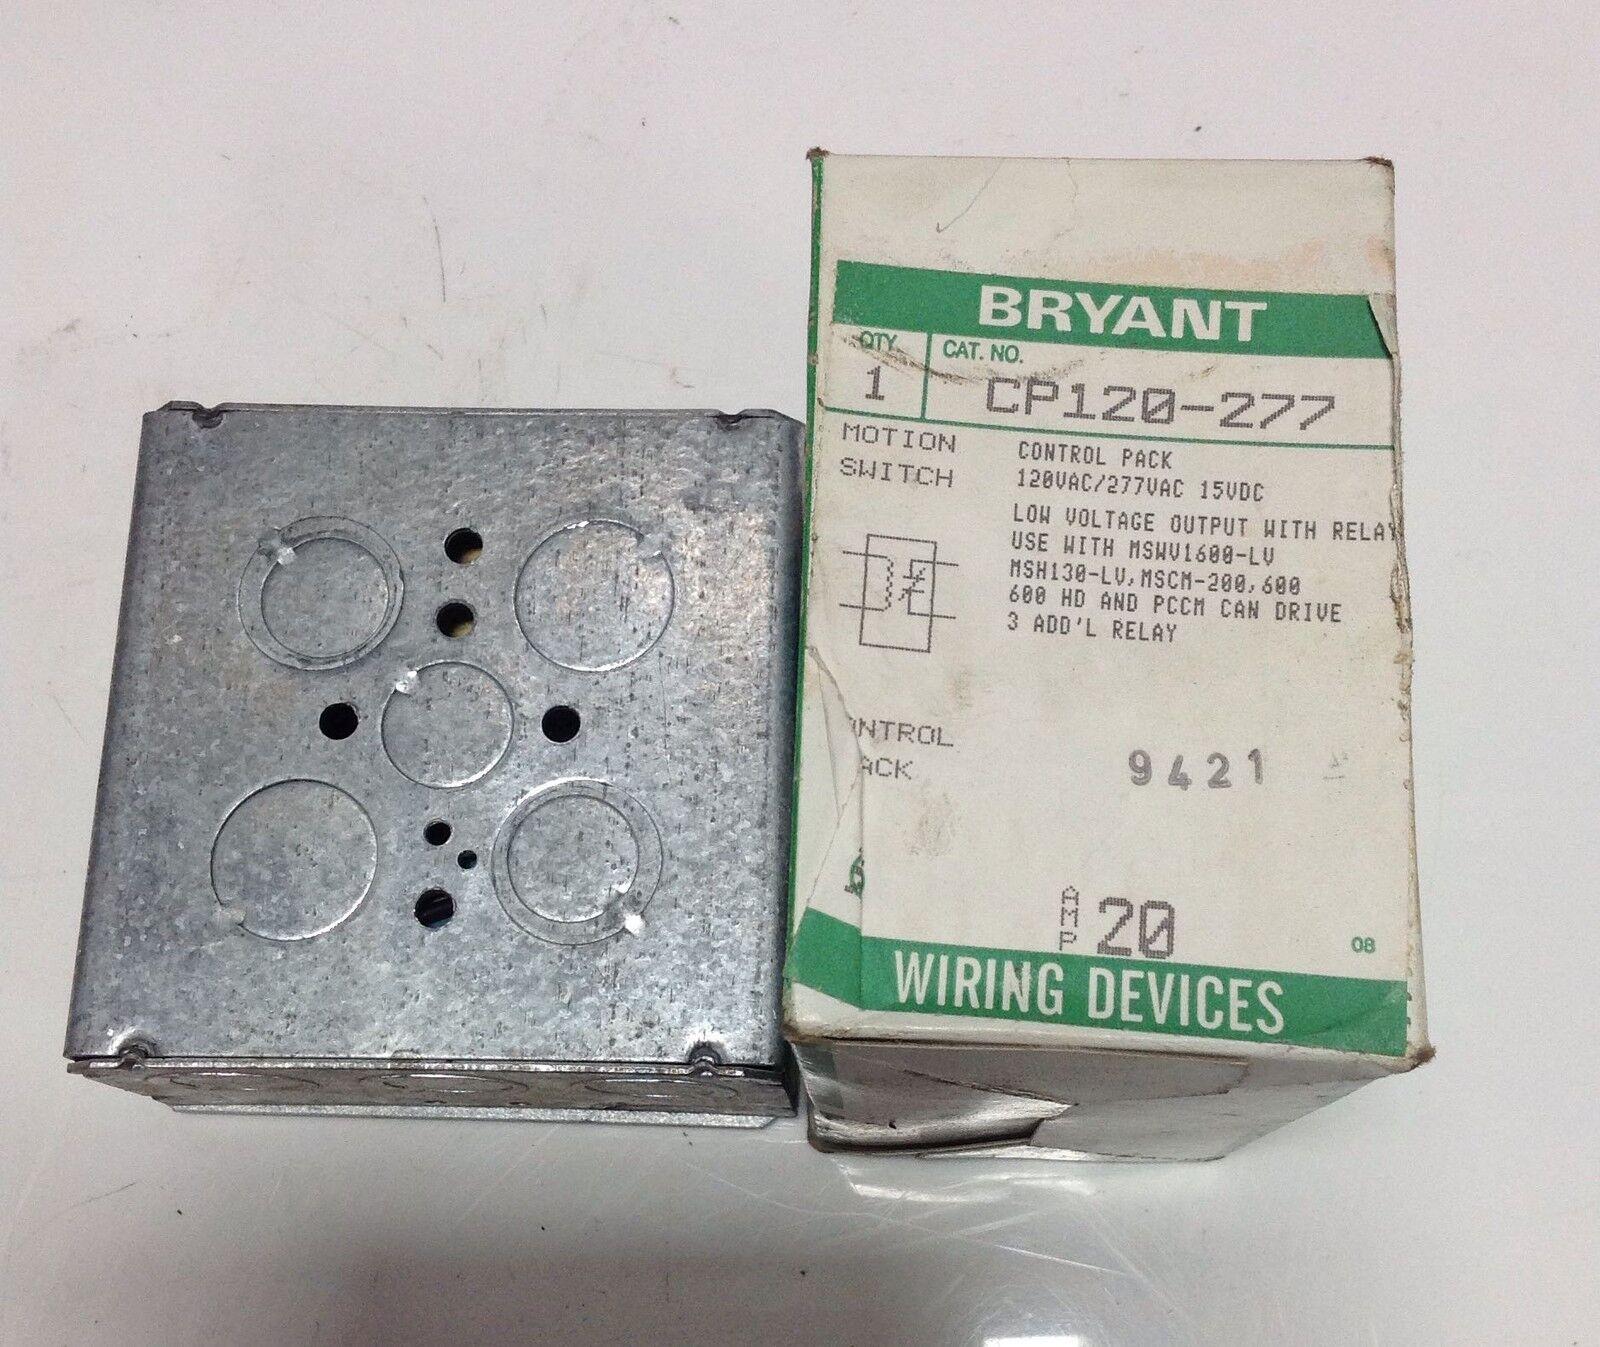 Superb Bryant Wiring Device Cp120 277 103007 Ebay Wiring Database Ittabxeroyuccorg